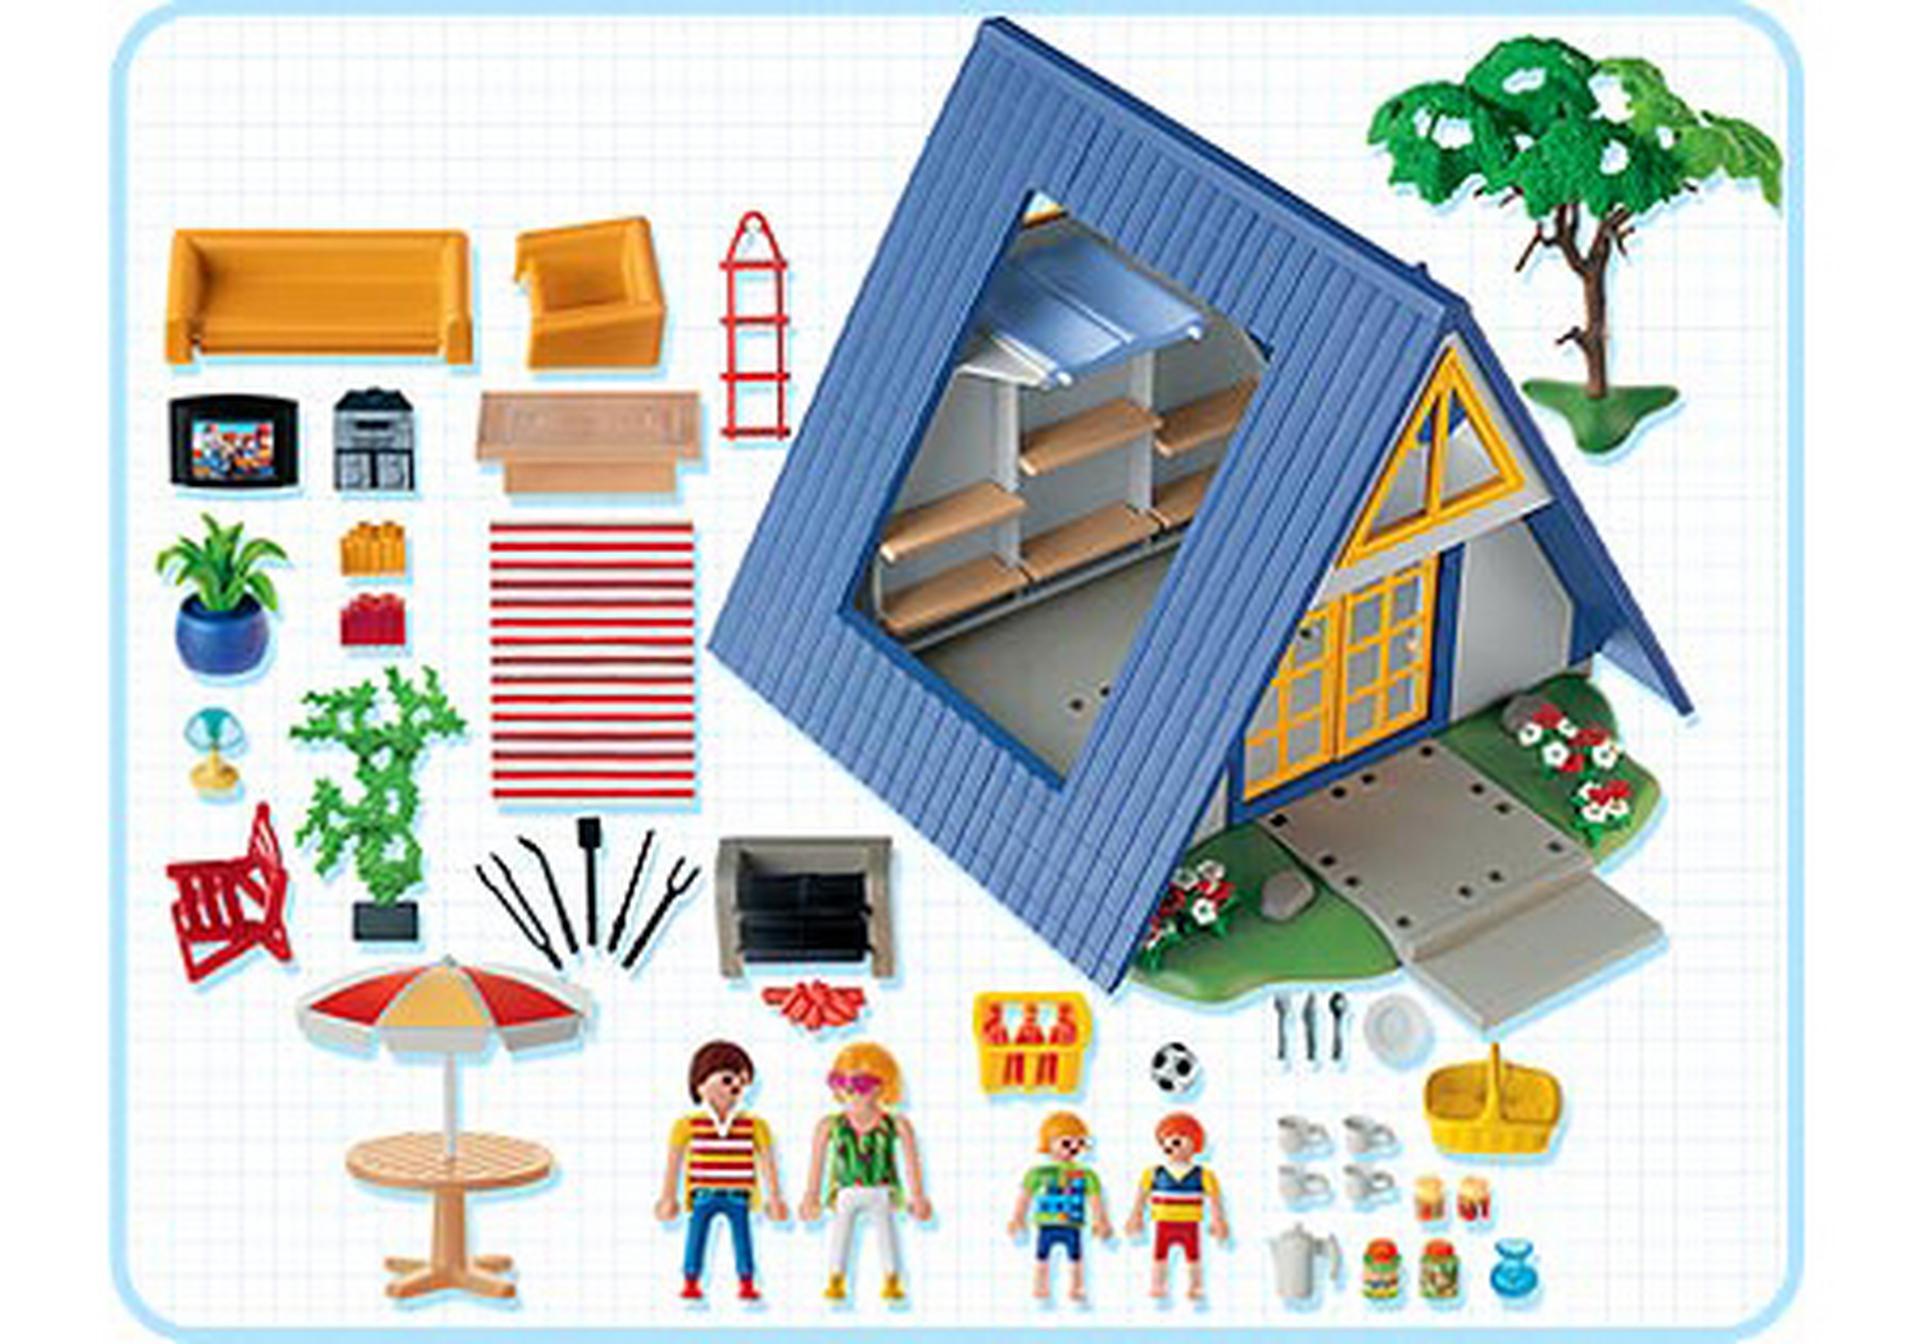 Ferienhaus 3230 a playmobil deutschland for Jugendzimmer playmobil